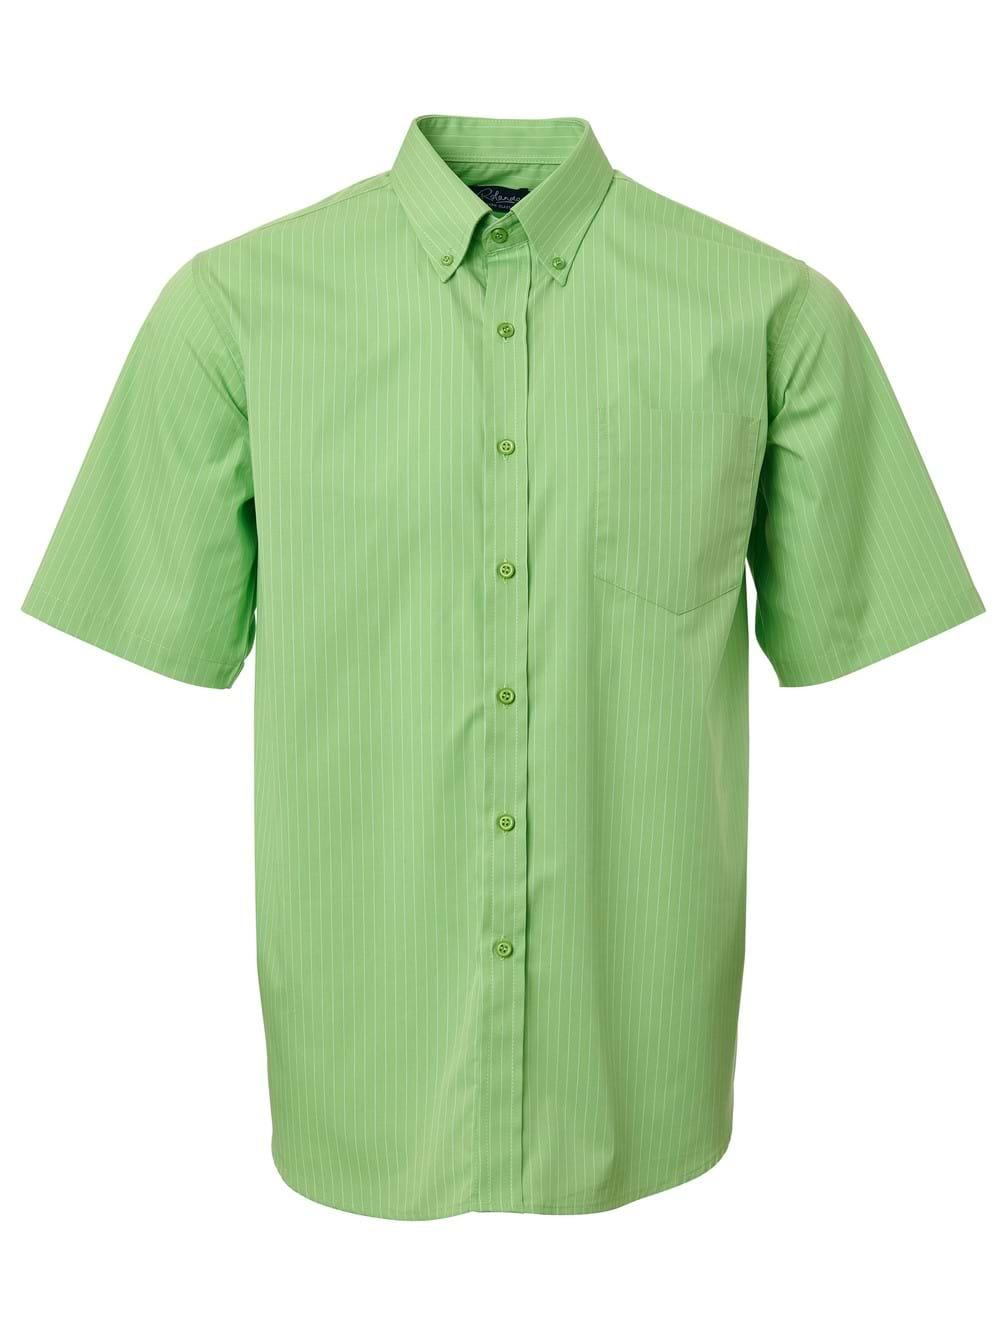 Mens Stripe Short Sleeve Shirt Lime